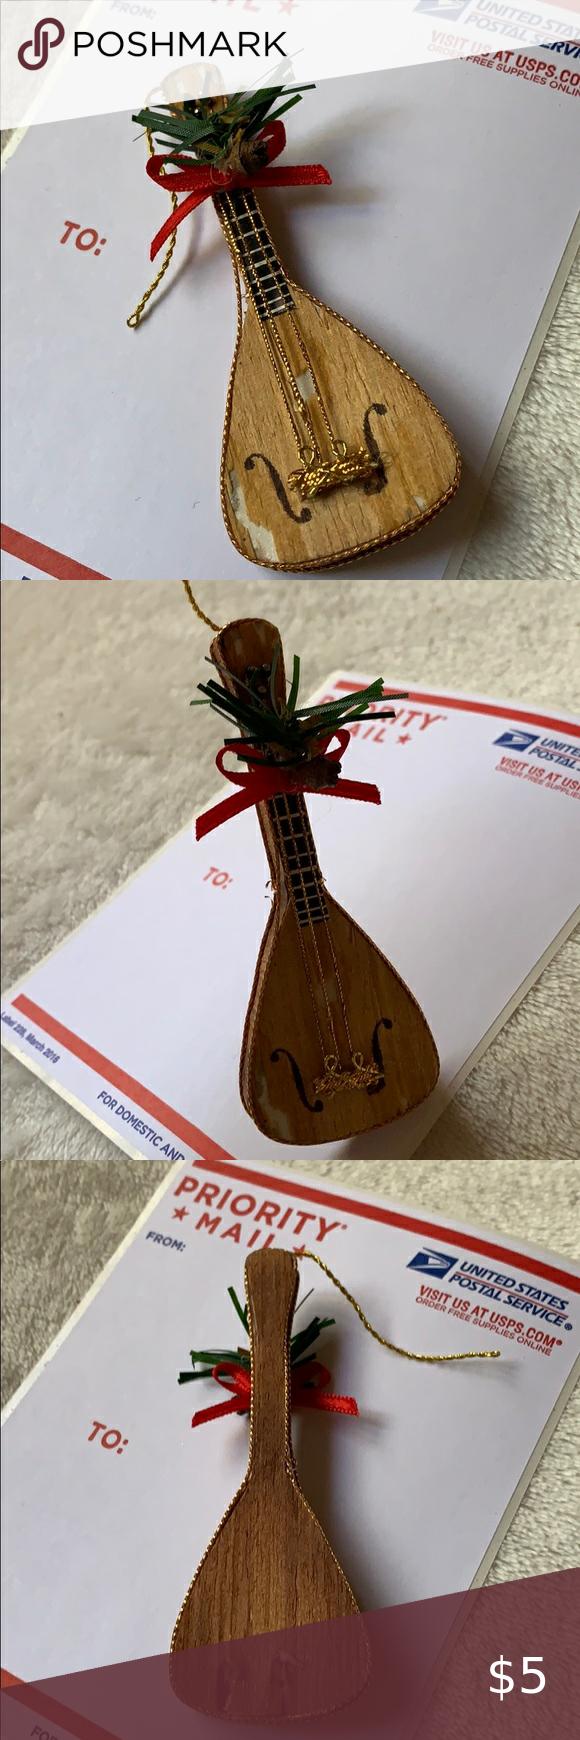 "3.5"" vintage guitar 🎸 Christmas tree ornament in 2020 ..."